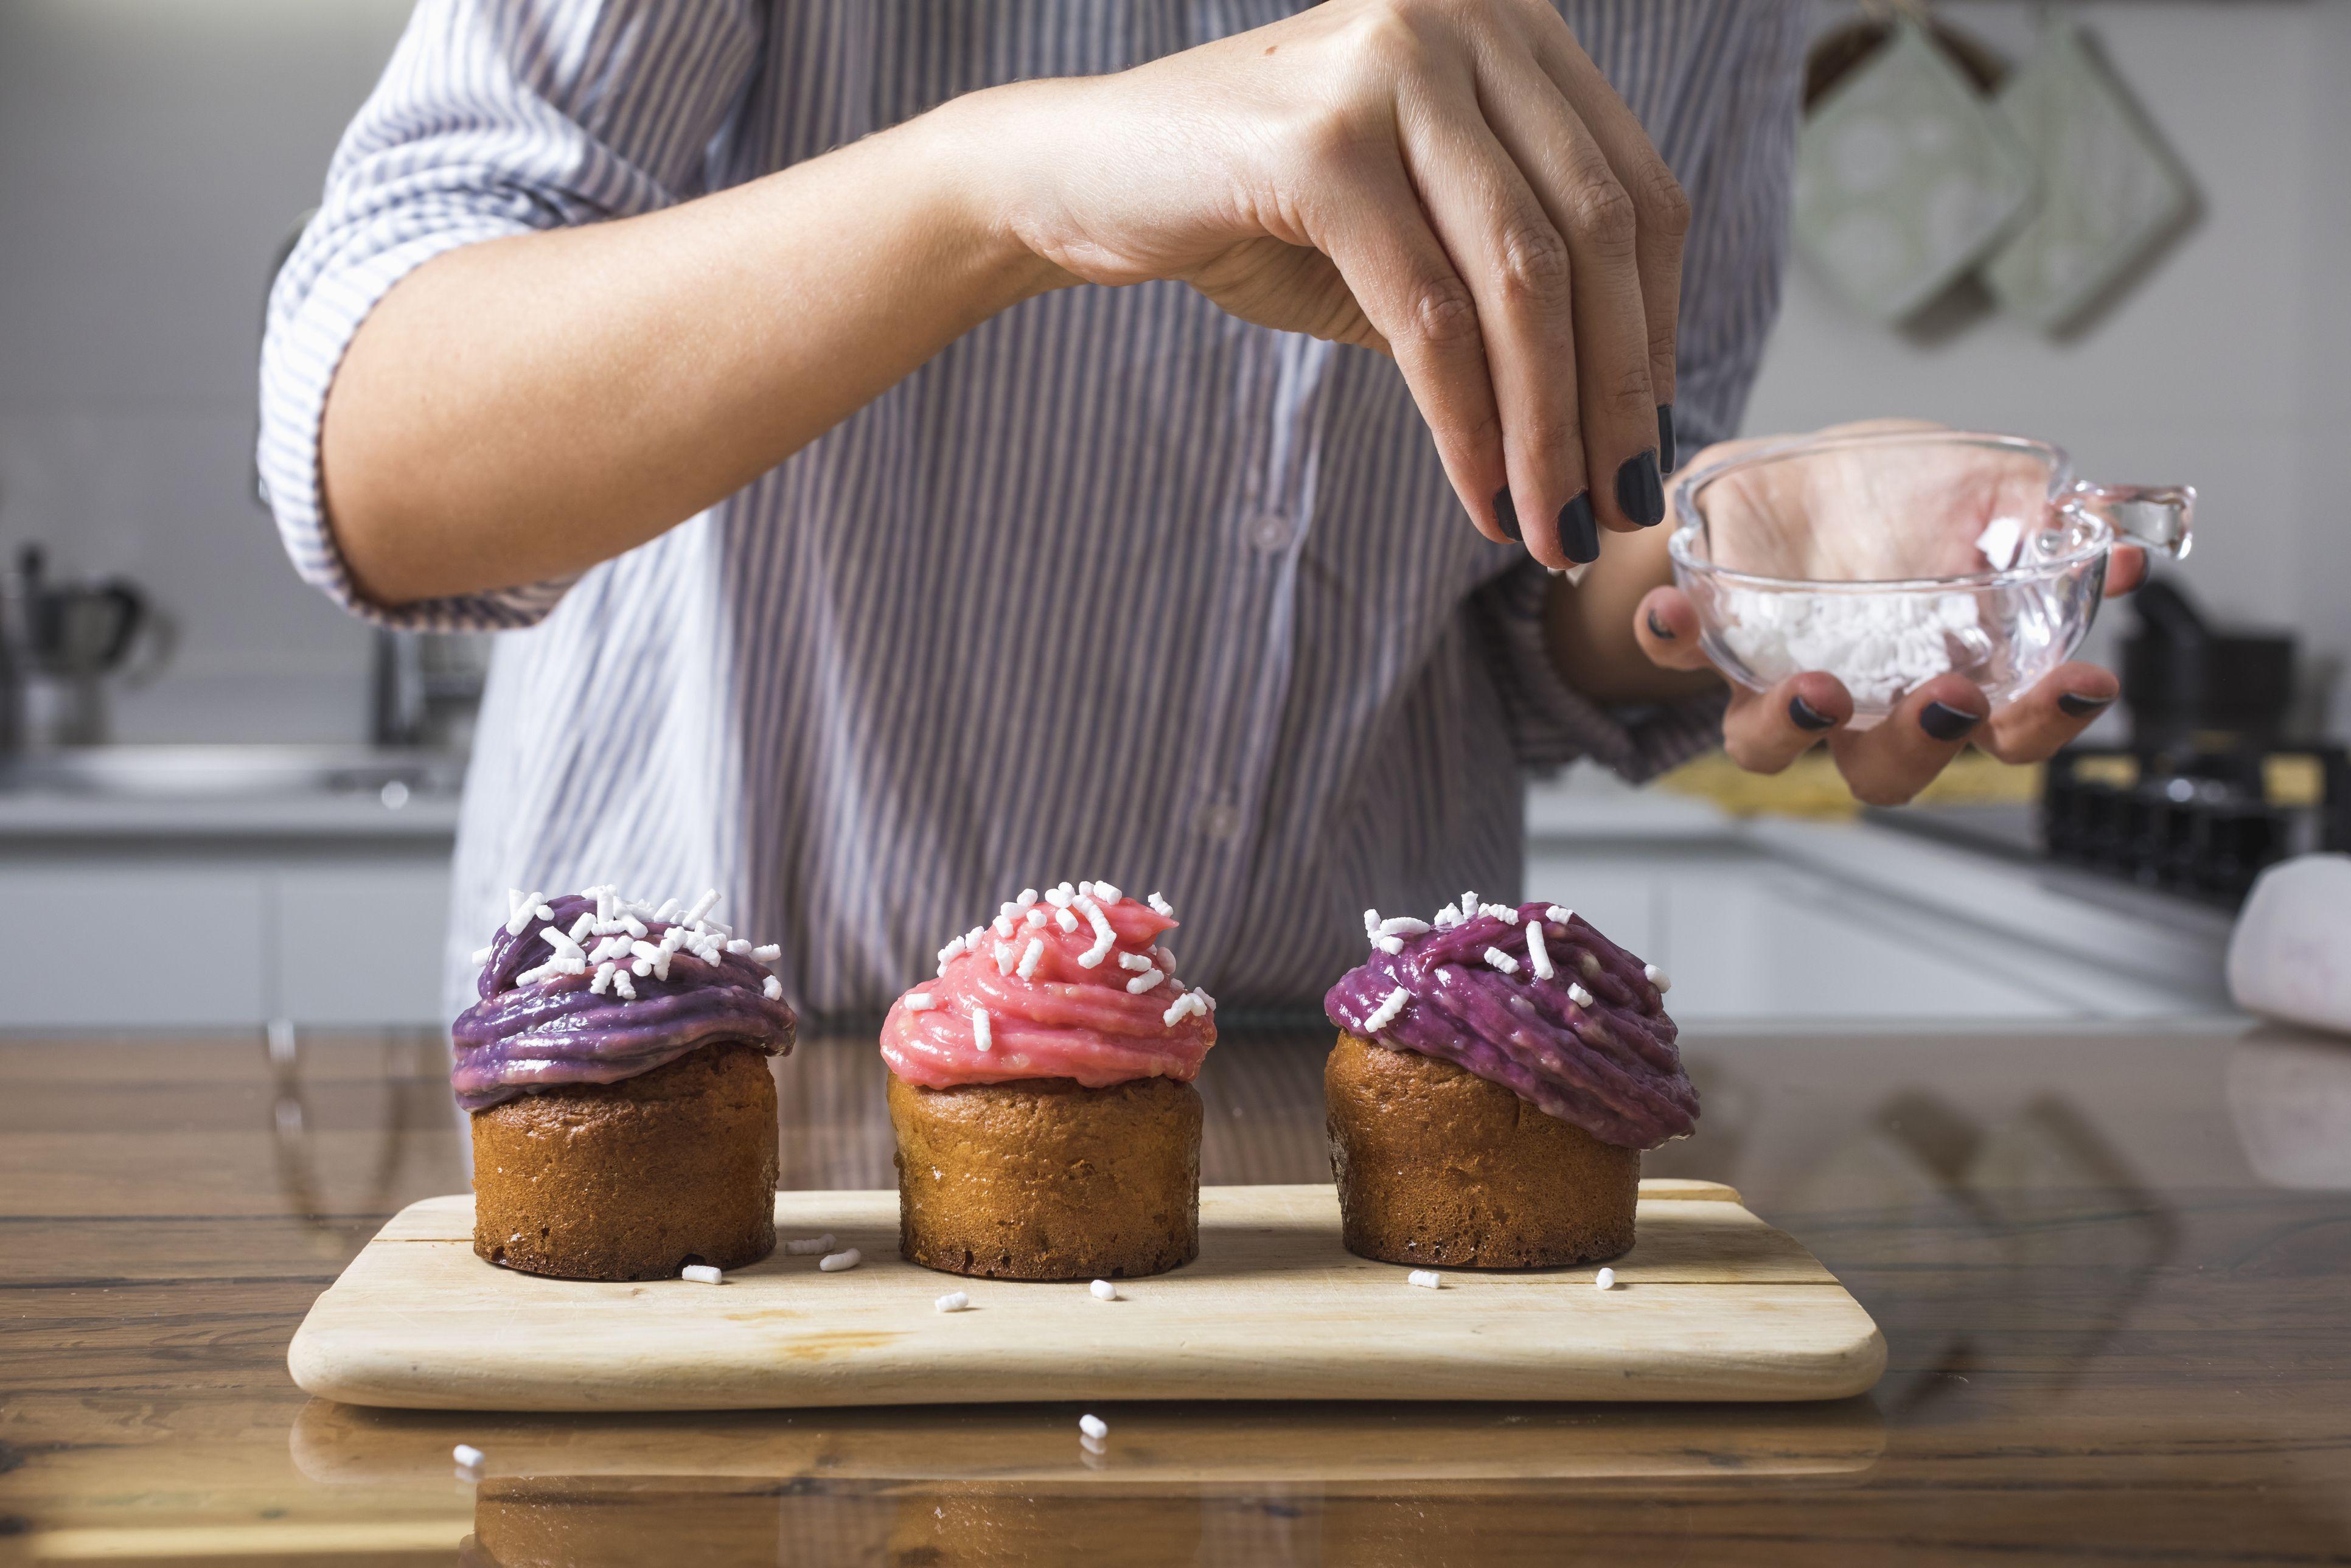 Woman preparing muffins at home